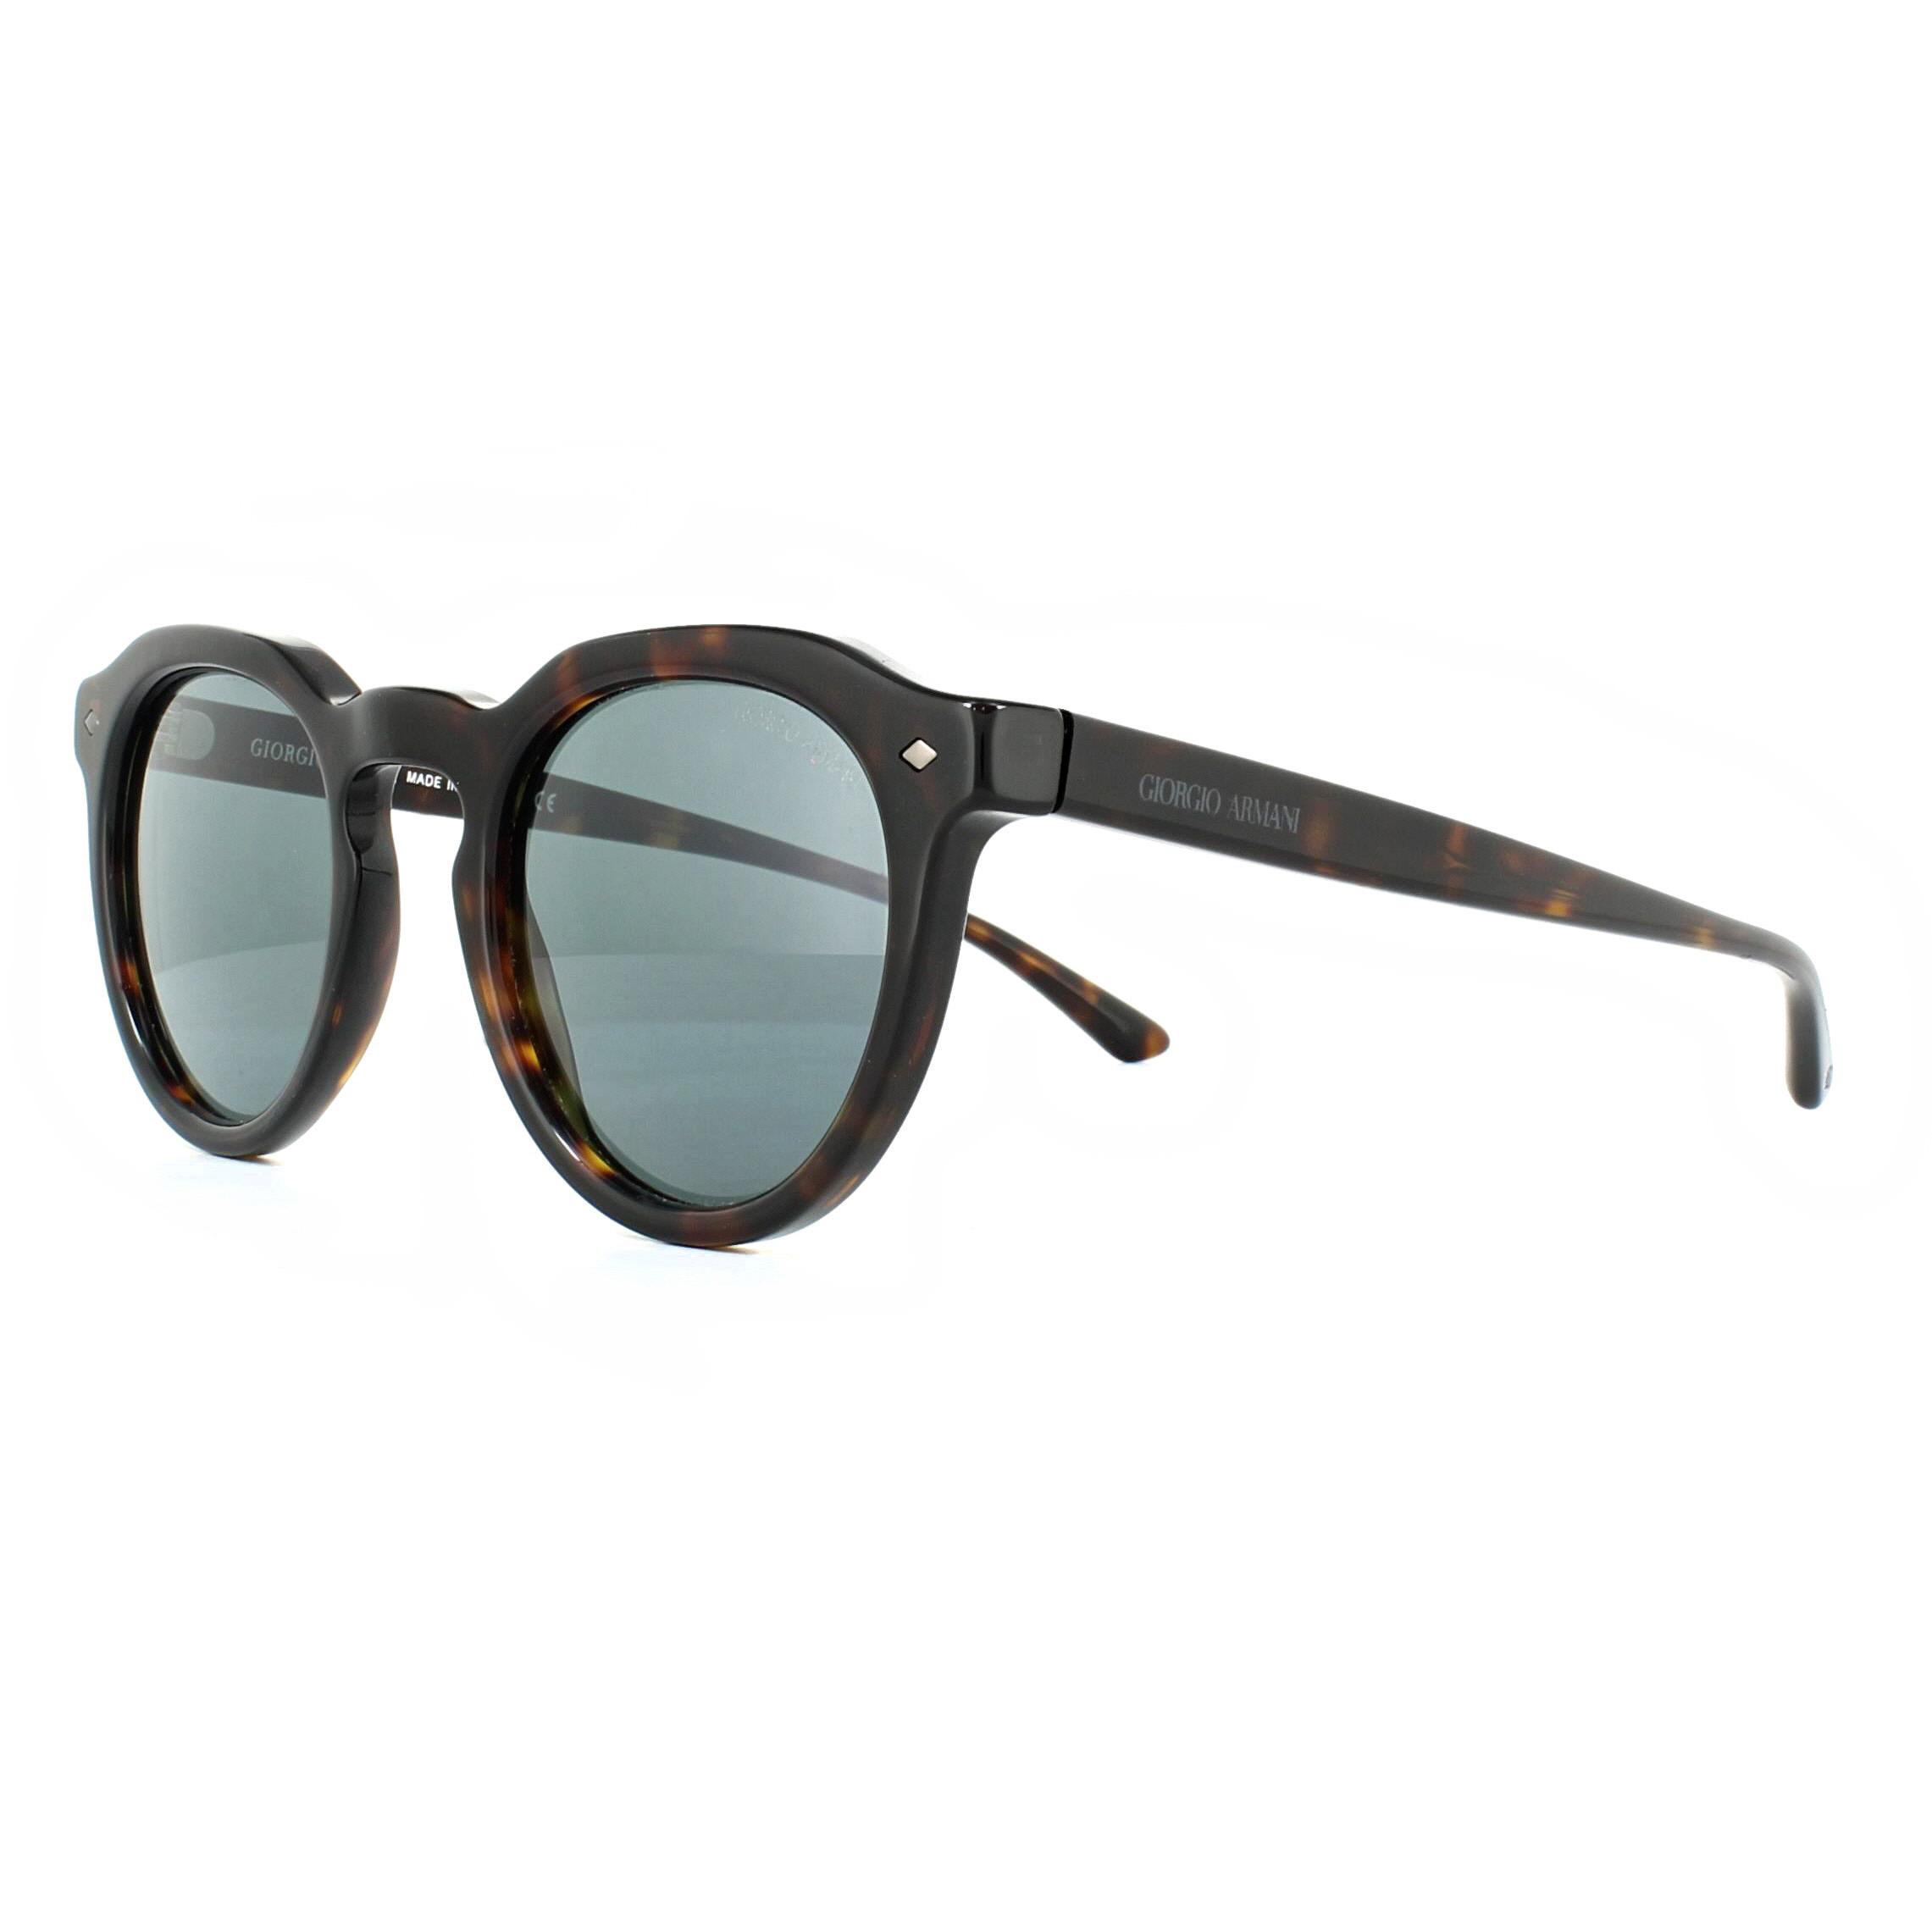 a46a4ab3b1f1 Sentinel Giorgio Armani Sunglasses AR8093 5026R5 Havana Grey. Sentinel Thumbnail  2